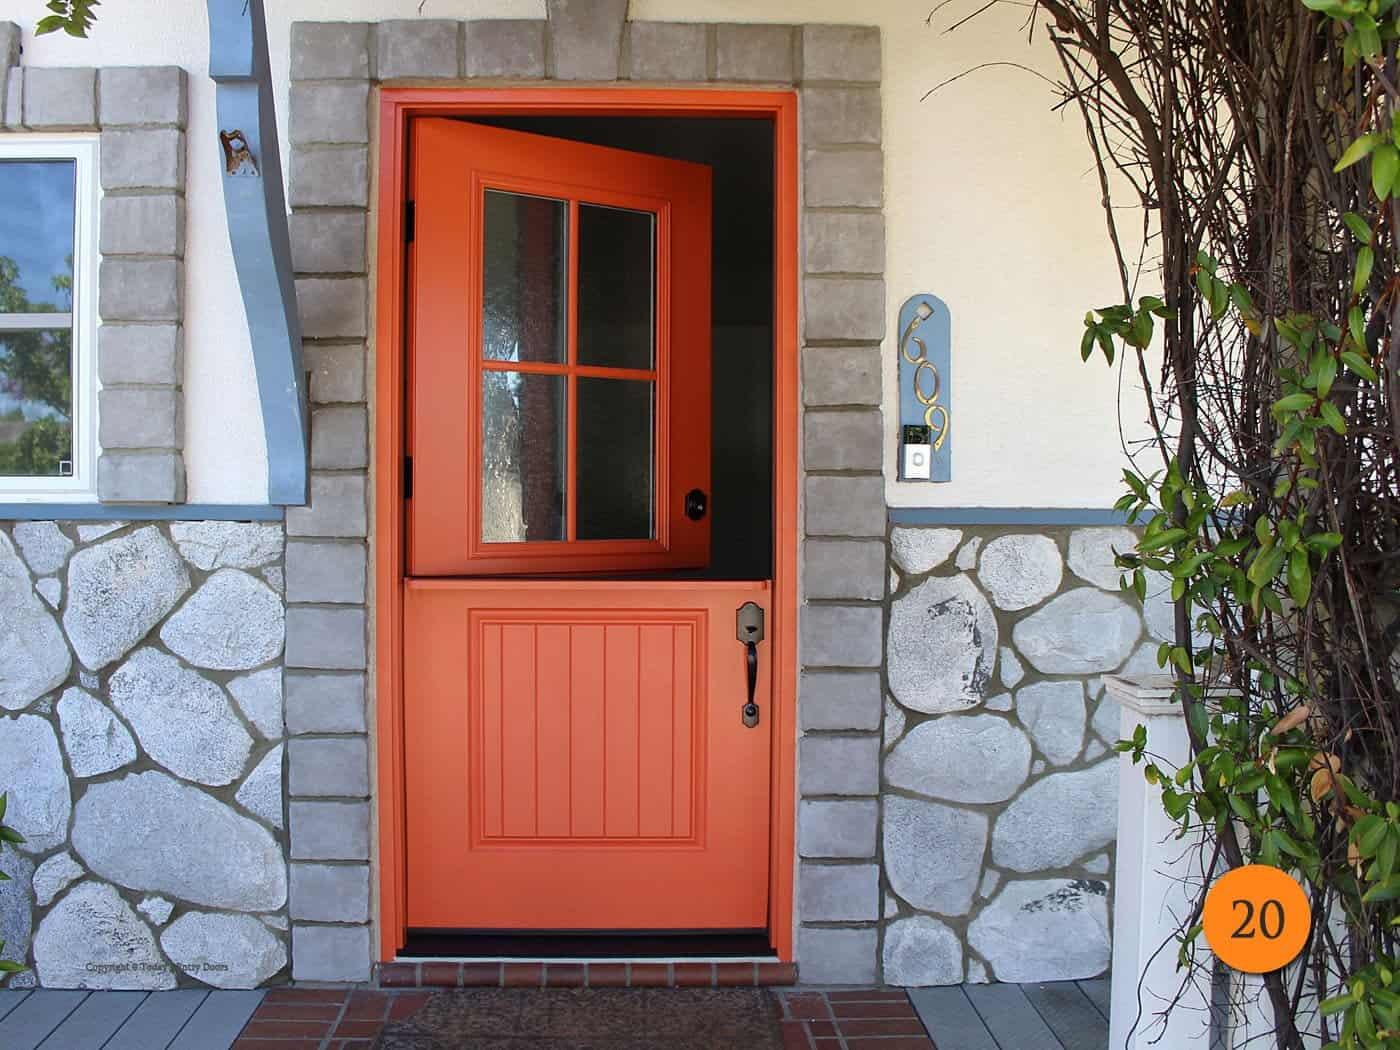 20-front-entry-door-classic-traditional-dutch-shelf-single-36x80-fiberglass-plastpro-drs2g-smooth-painted-citrus-notes-4-lite-sea-spray-glass-orange-ca-borgen